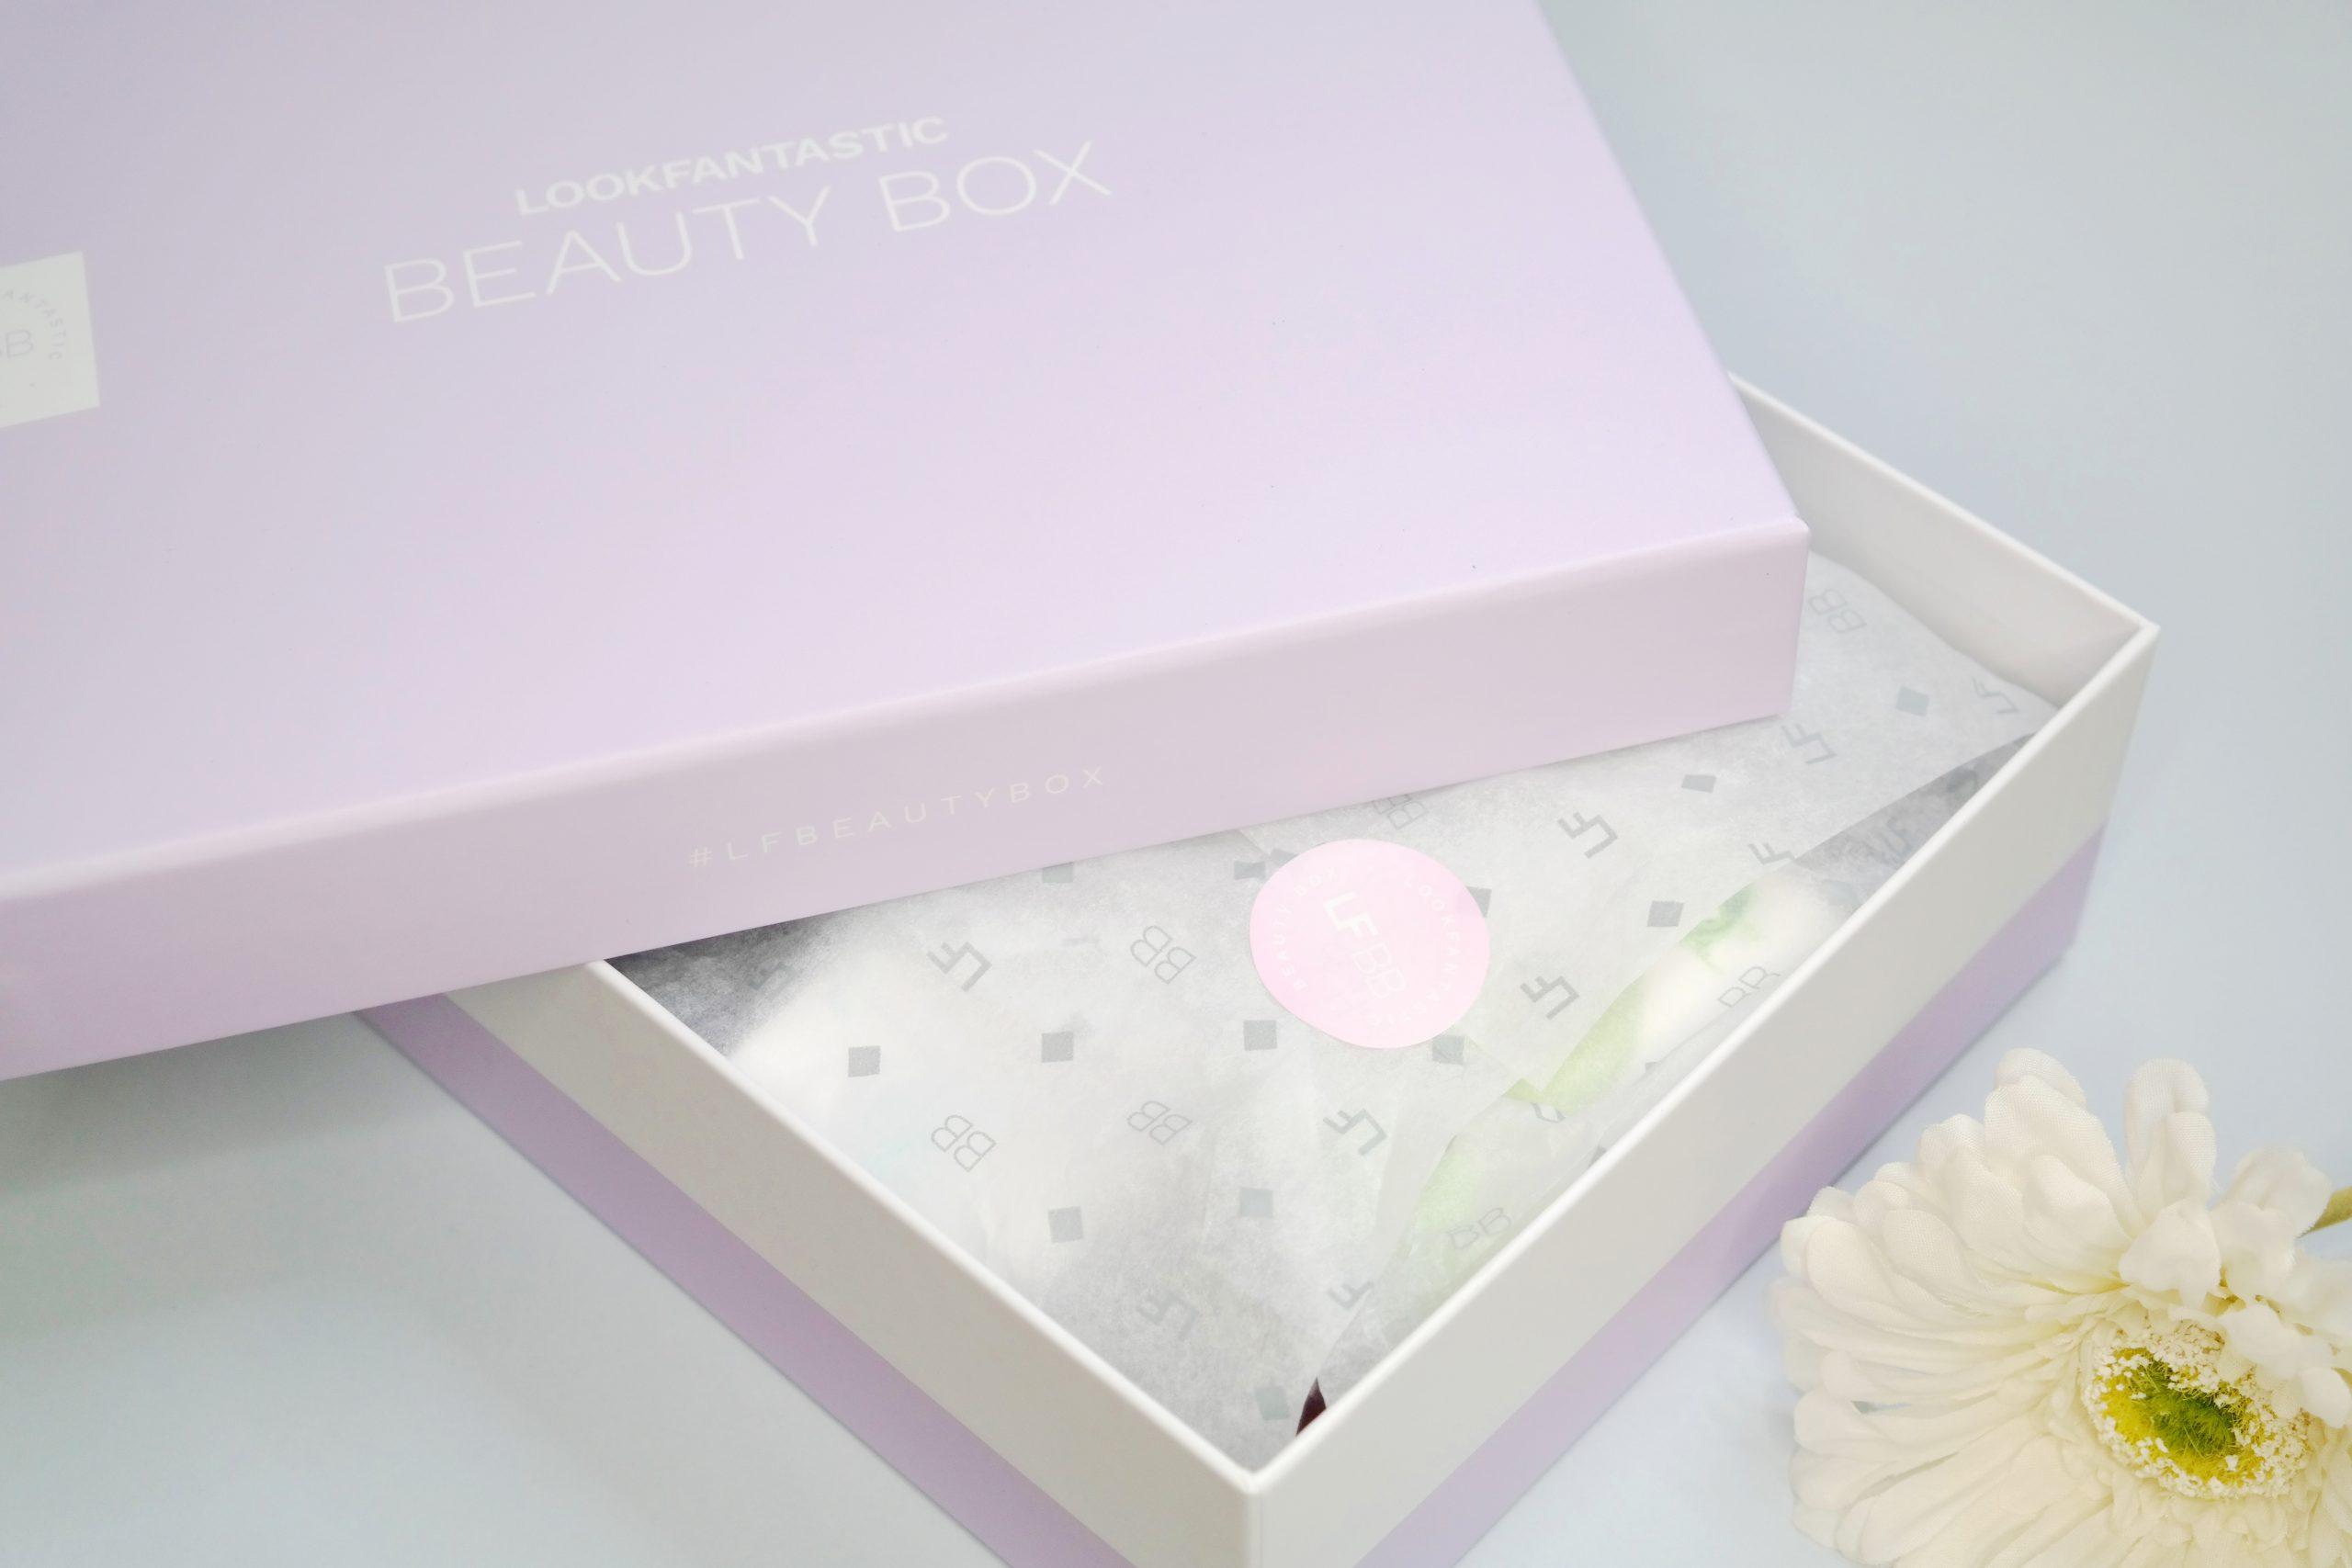 Lookfantastic Beauty Box Tammikuu